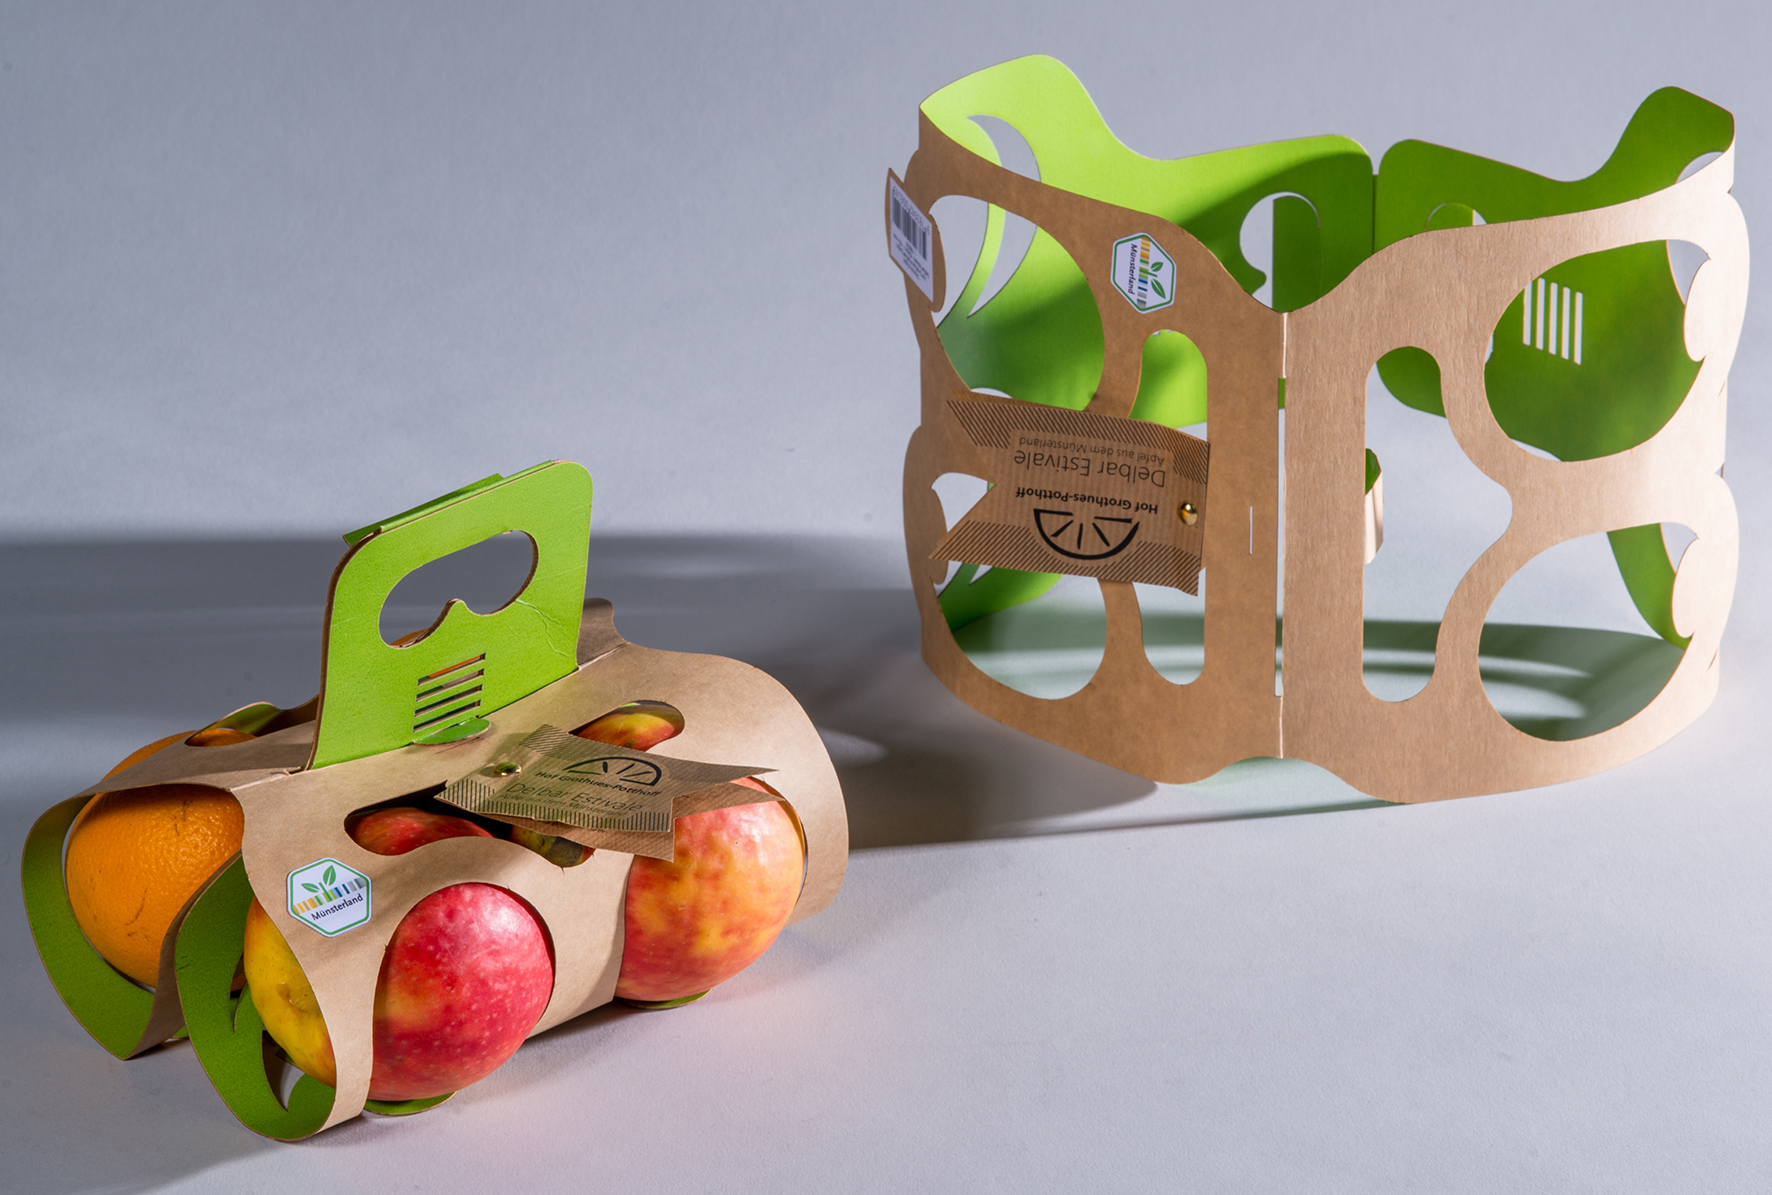 Preisgekrönte Apfelverpackung